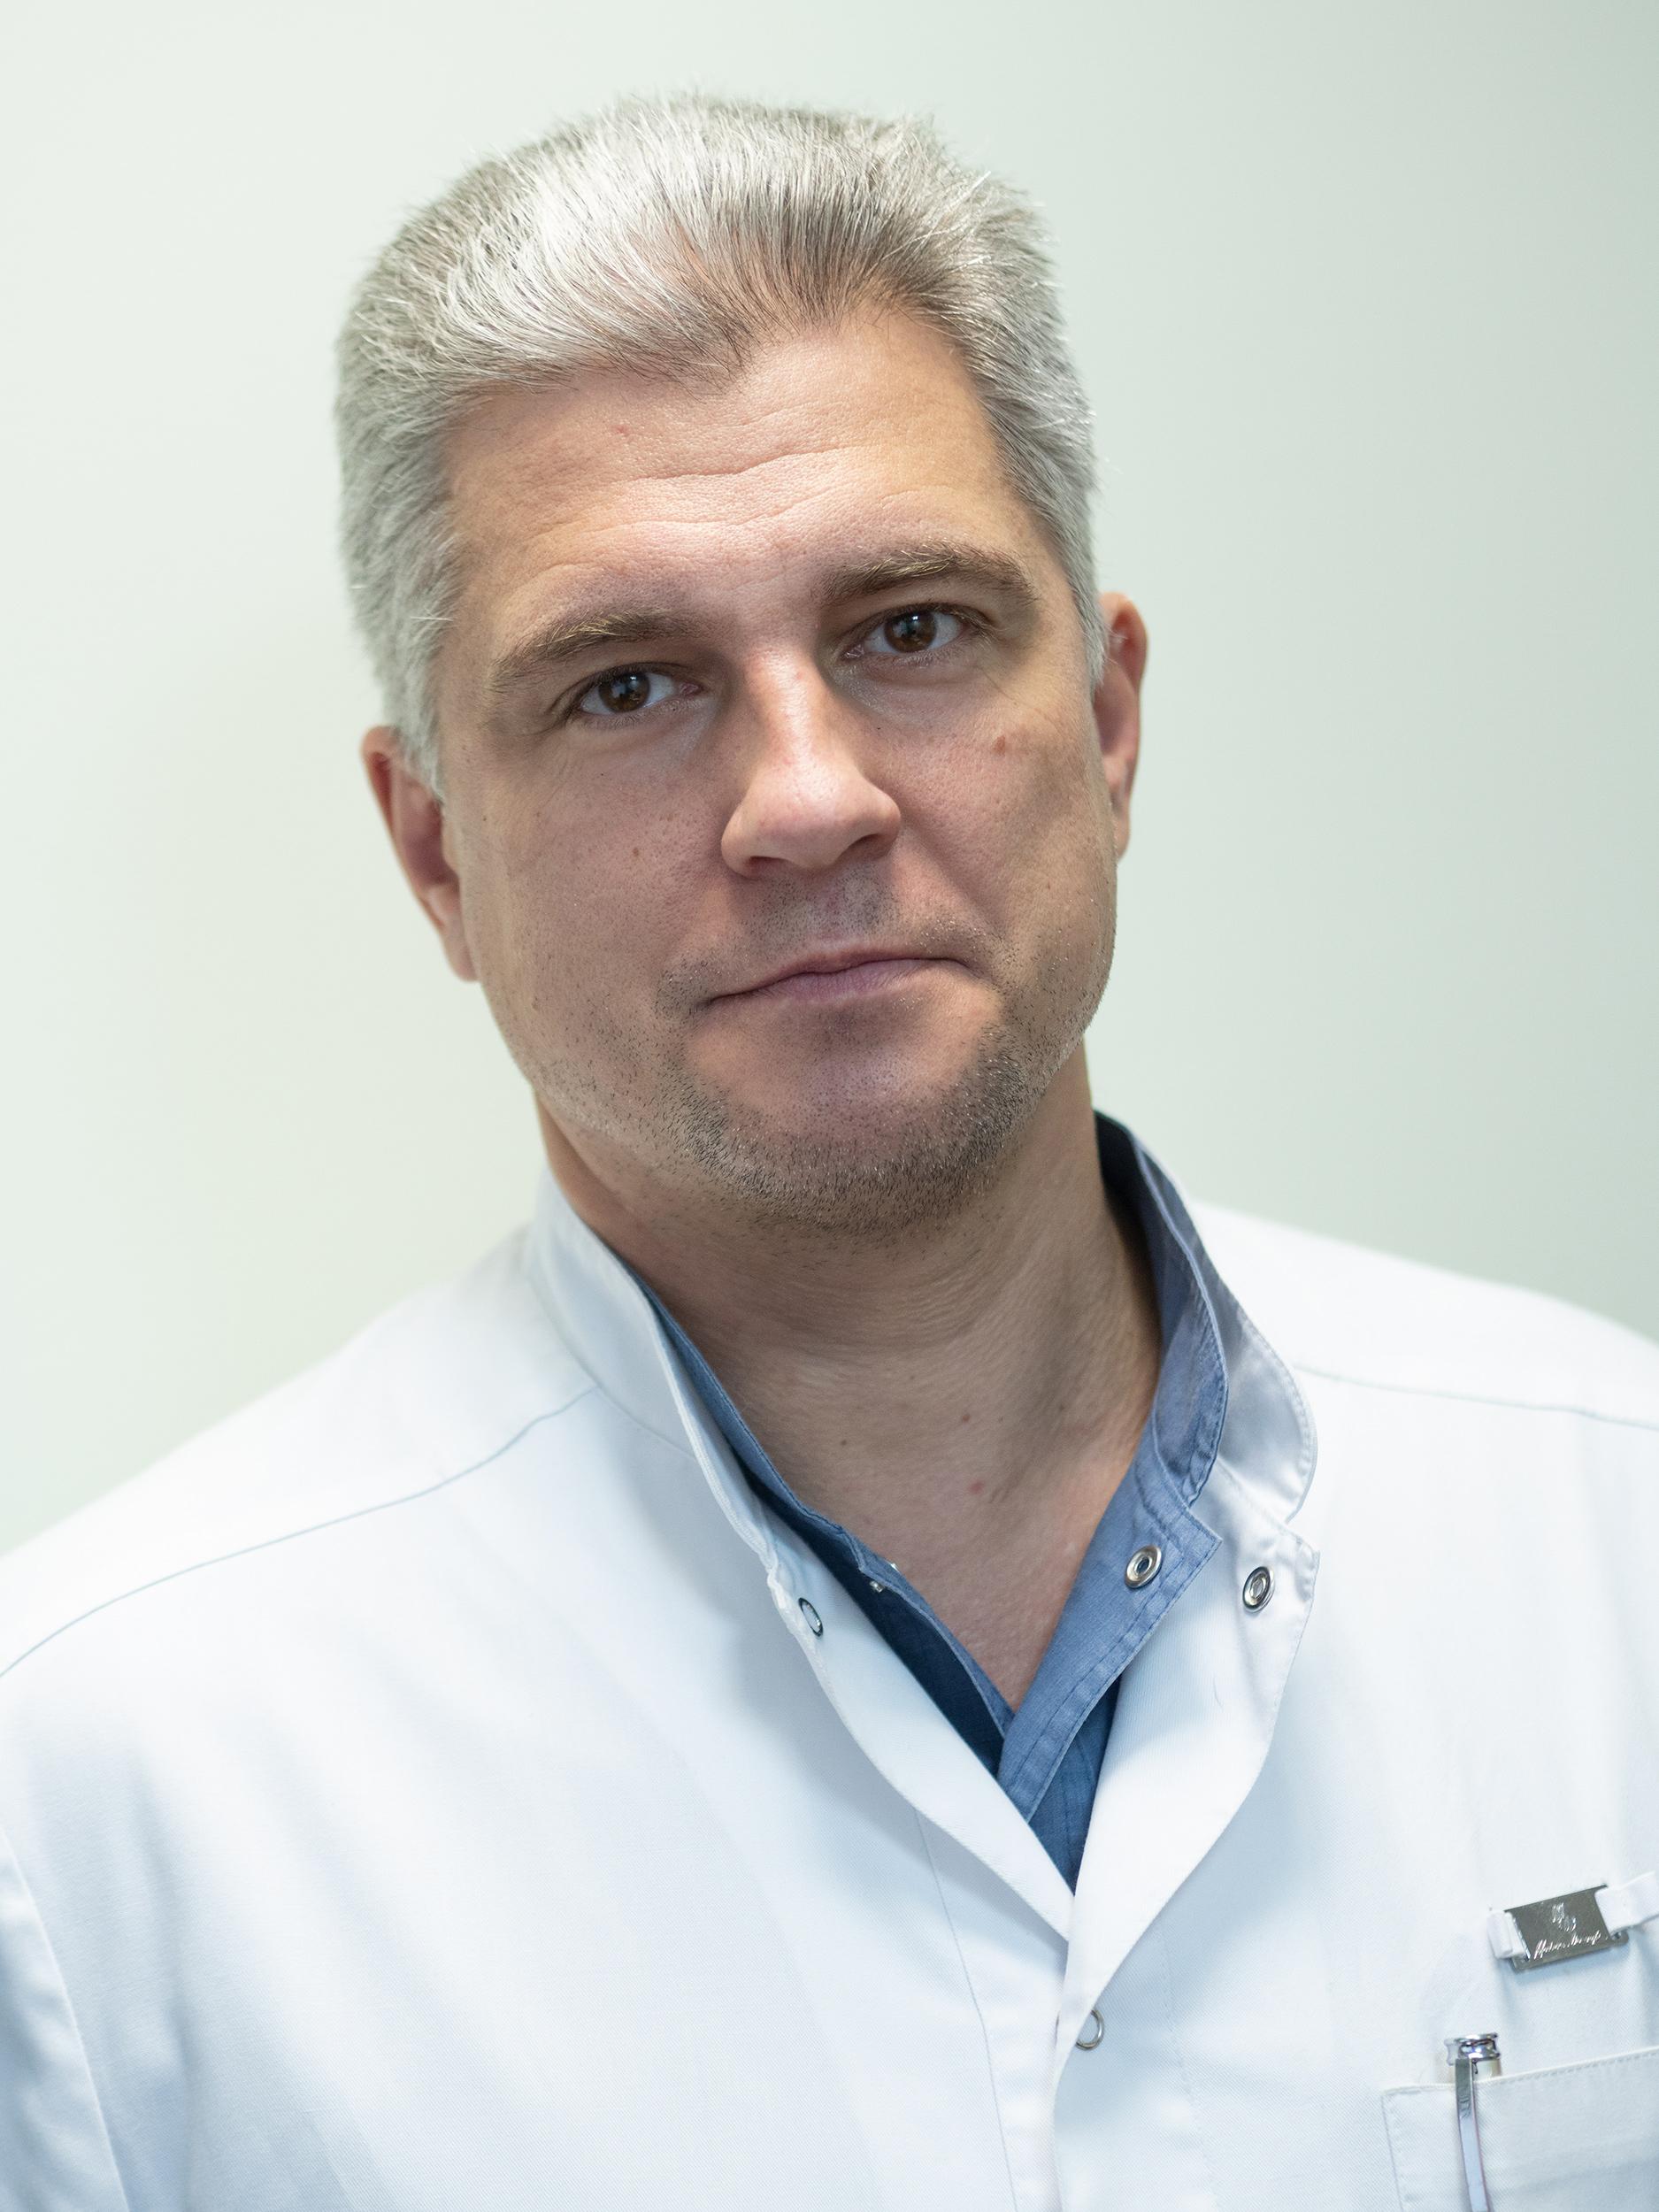 Светлов Дмитрий Владимирович